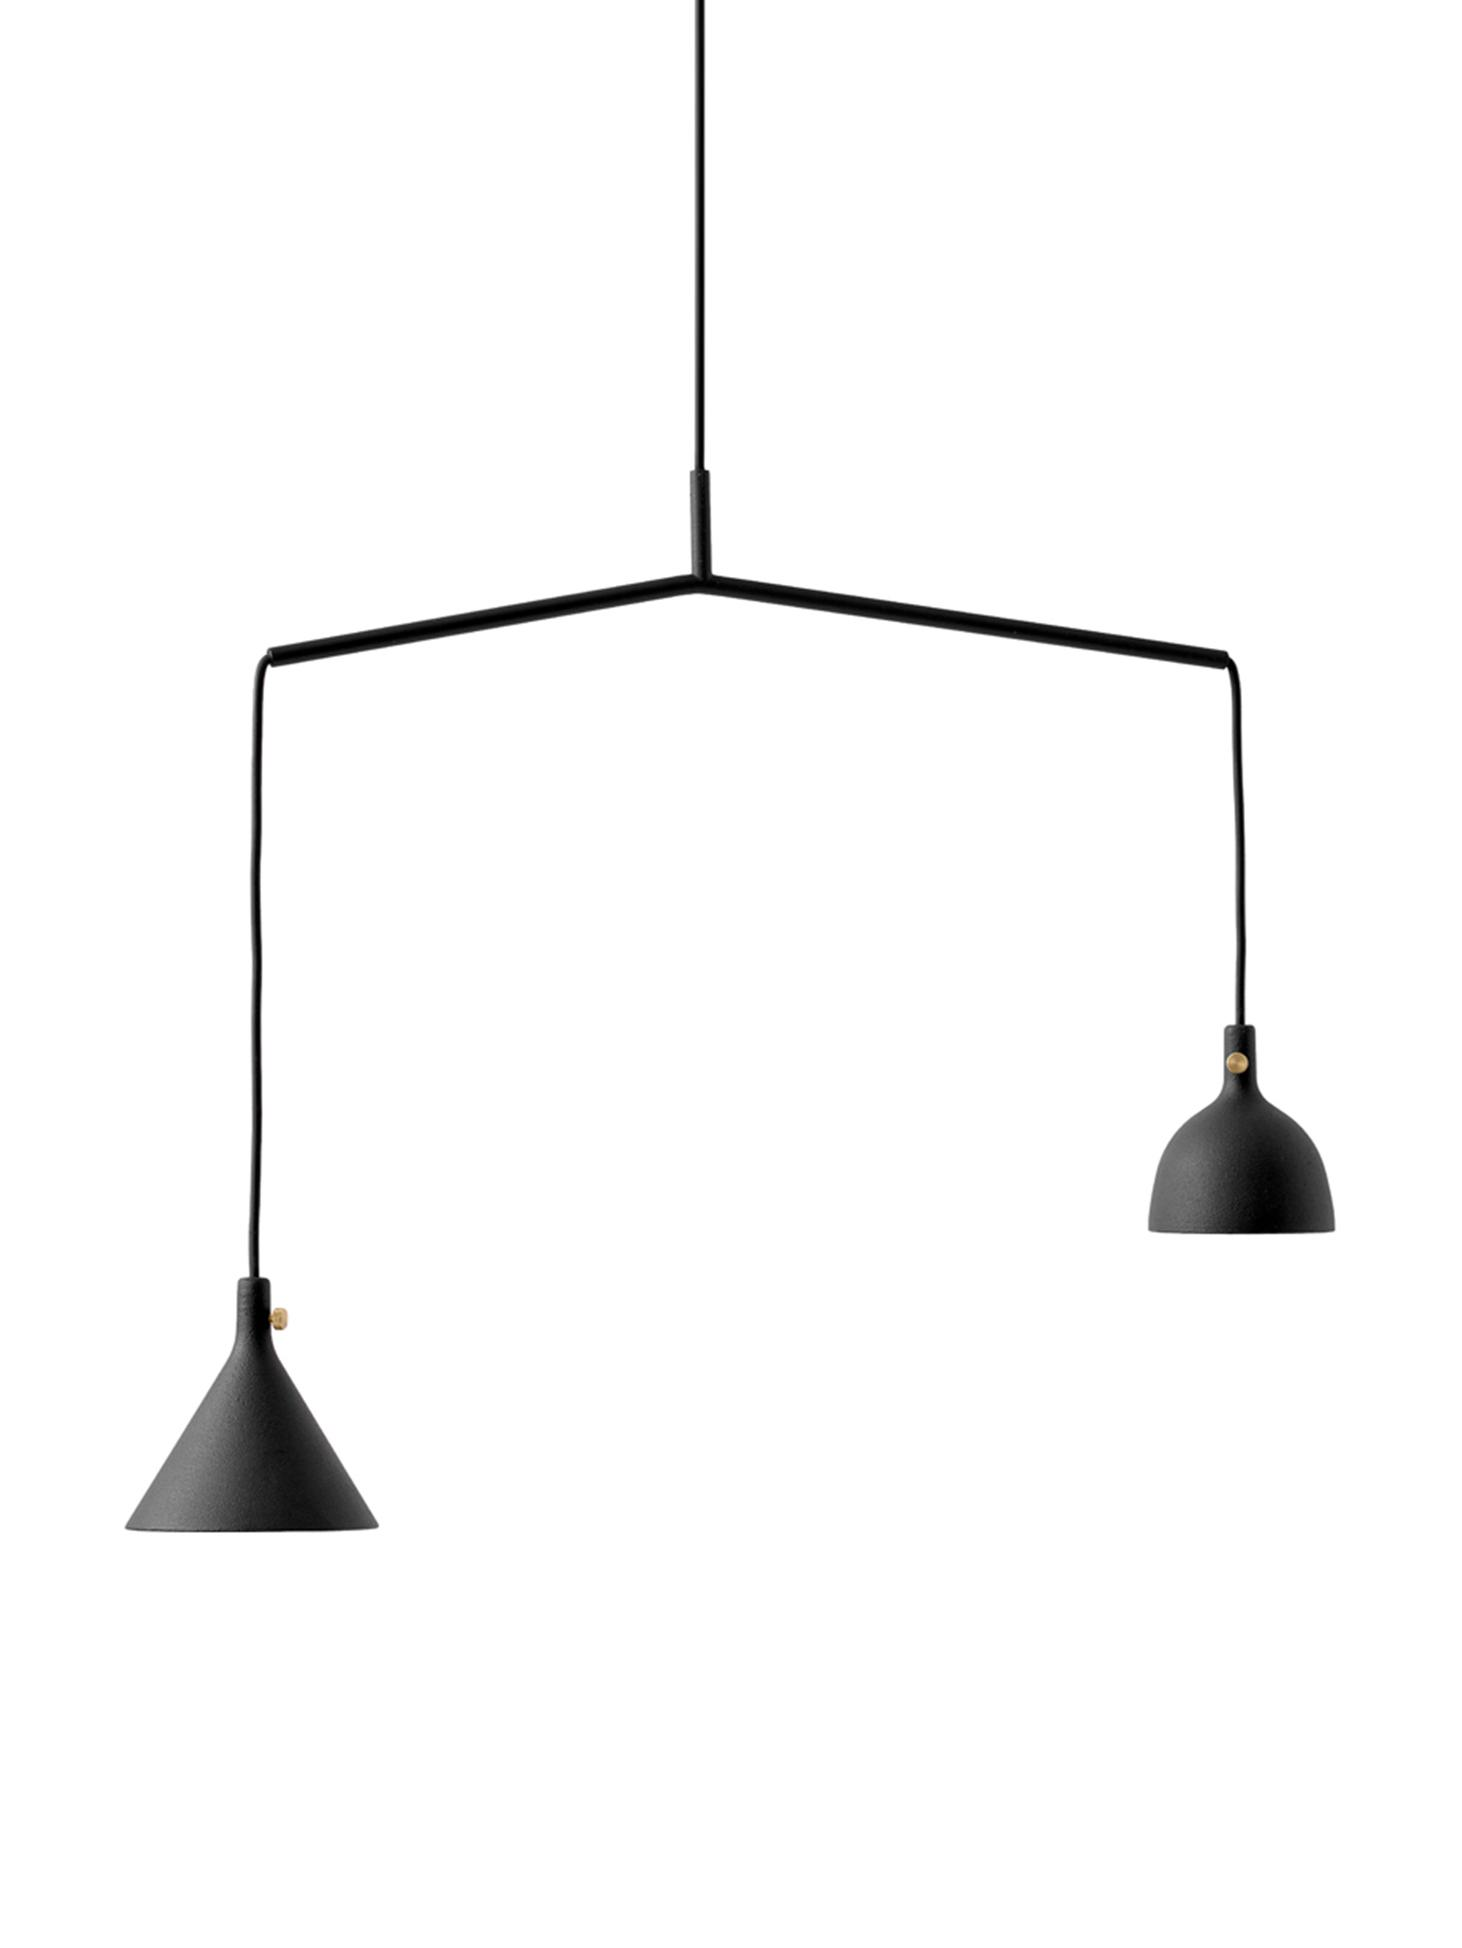 Hanglamp Cast, Lampenkap: gecoat aluminium, messing, Zwart, 66 x 432 cm